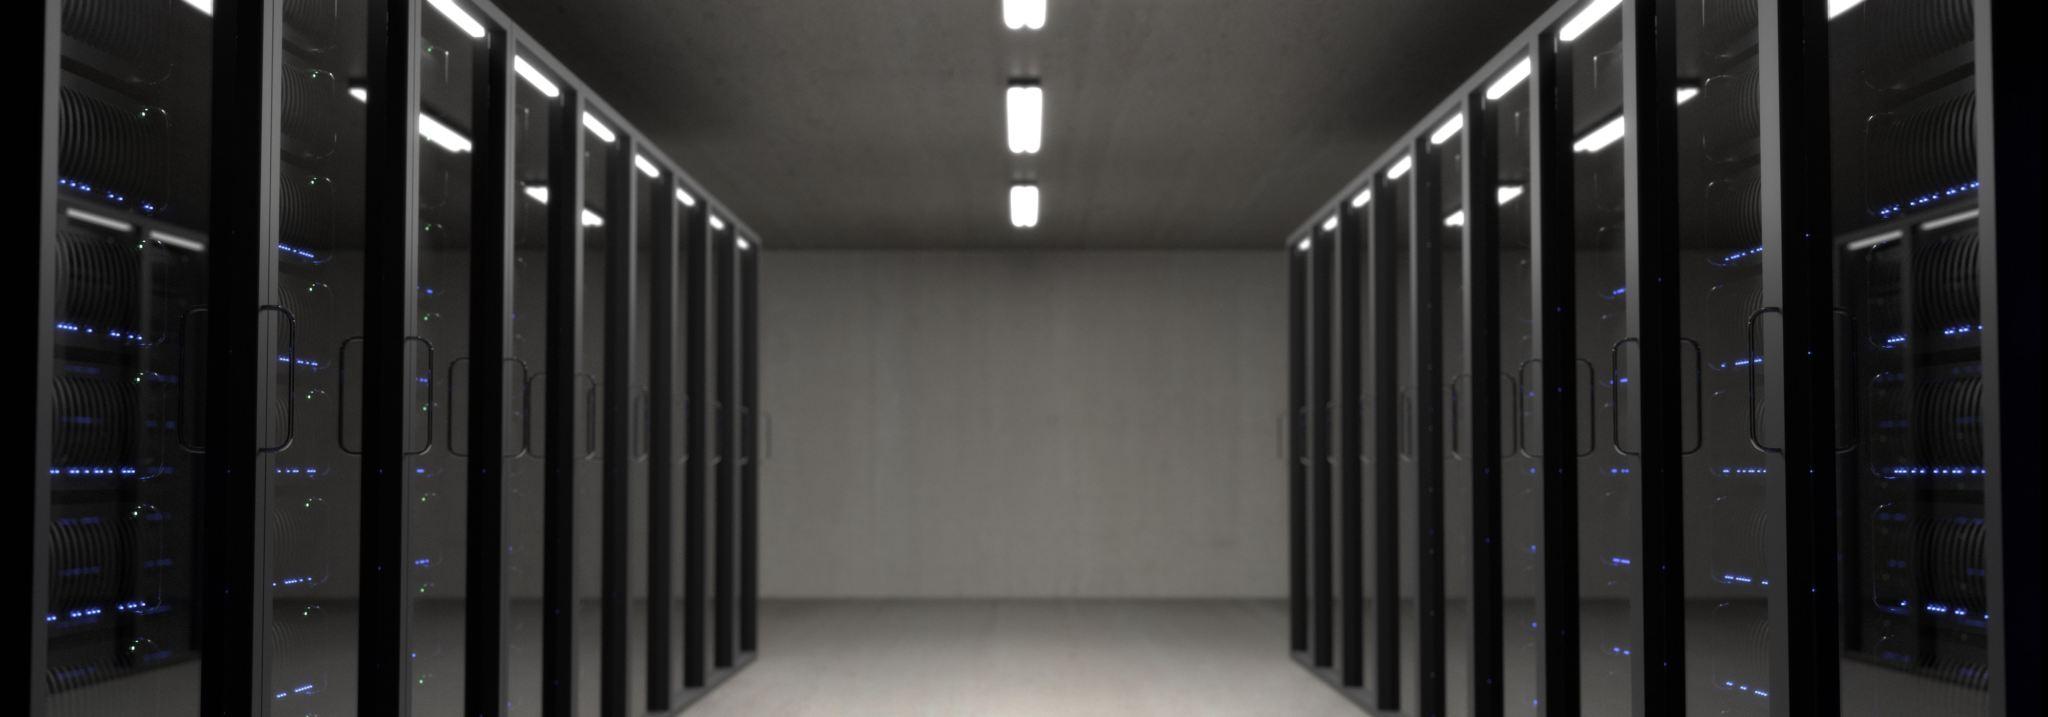 szafy telekomunikacyjne